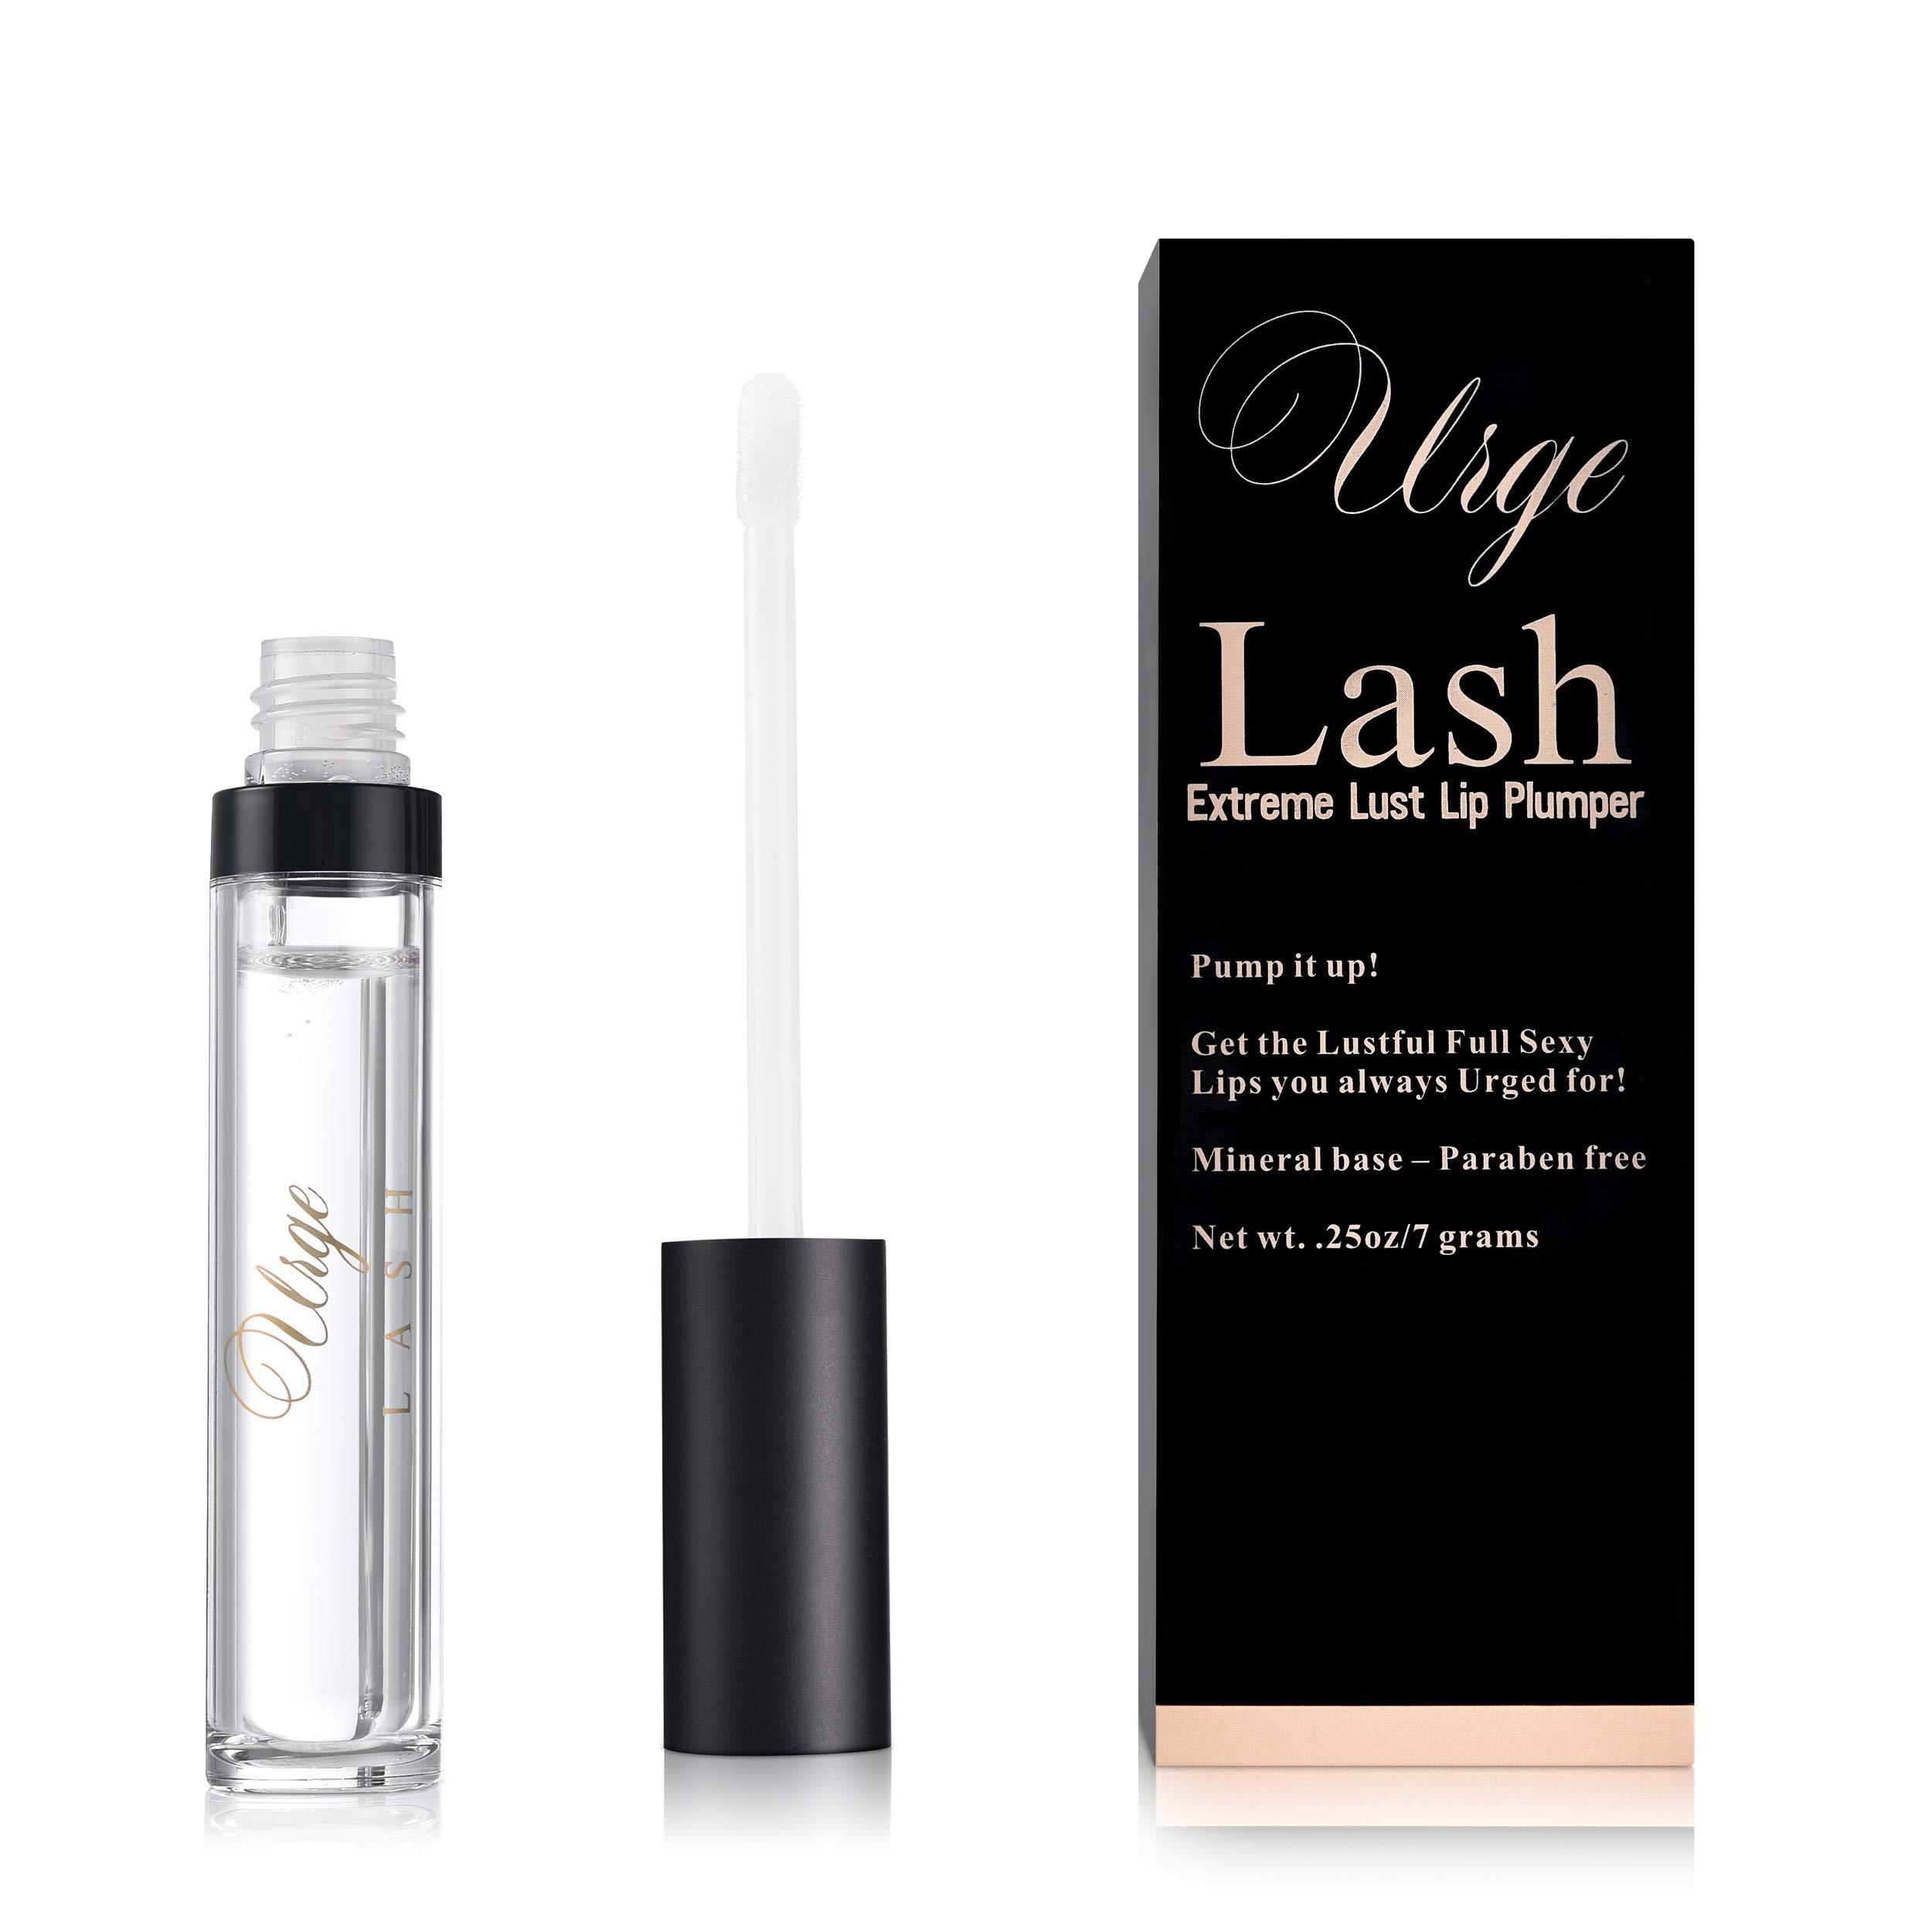 lip plumper extreme lip plumper collagen for Fuller & Reduce Fine Lines- Natural Lip Enhancer that Moisturizes Eliminates Dryness Lip Plumper Clear-Liquid Lipstick Base-Liquid Lipstick-Lip Injection by Urge Lash